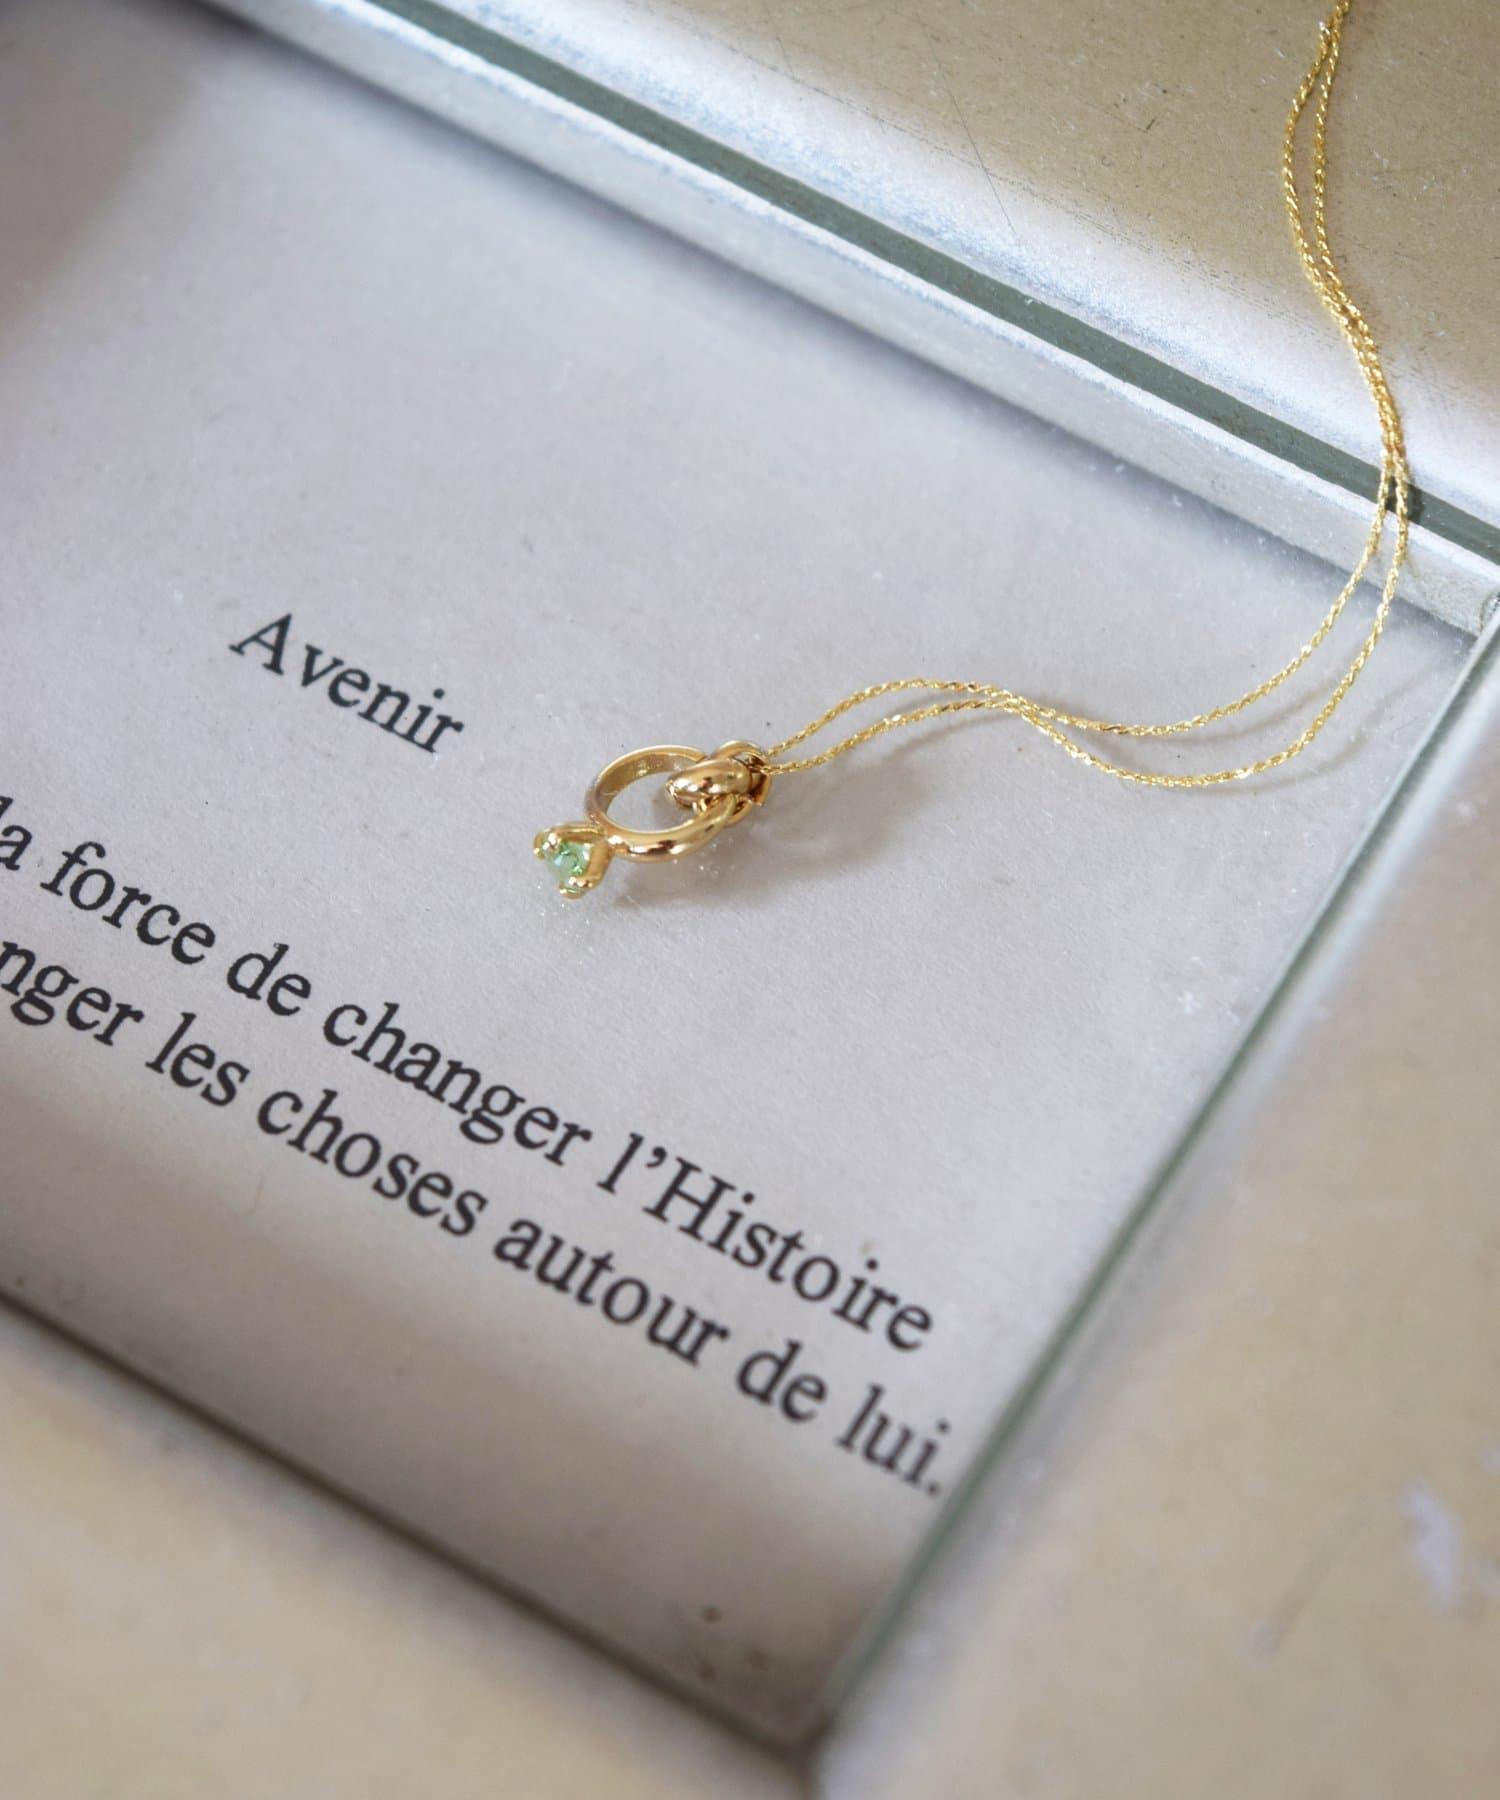 BIRTHDAY BAR(バースデイバー) レディース Birthstone Petit Ring Necklace 誕生石ネックレス エメラルド